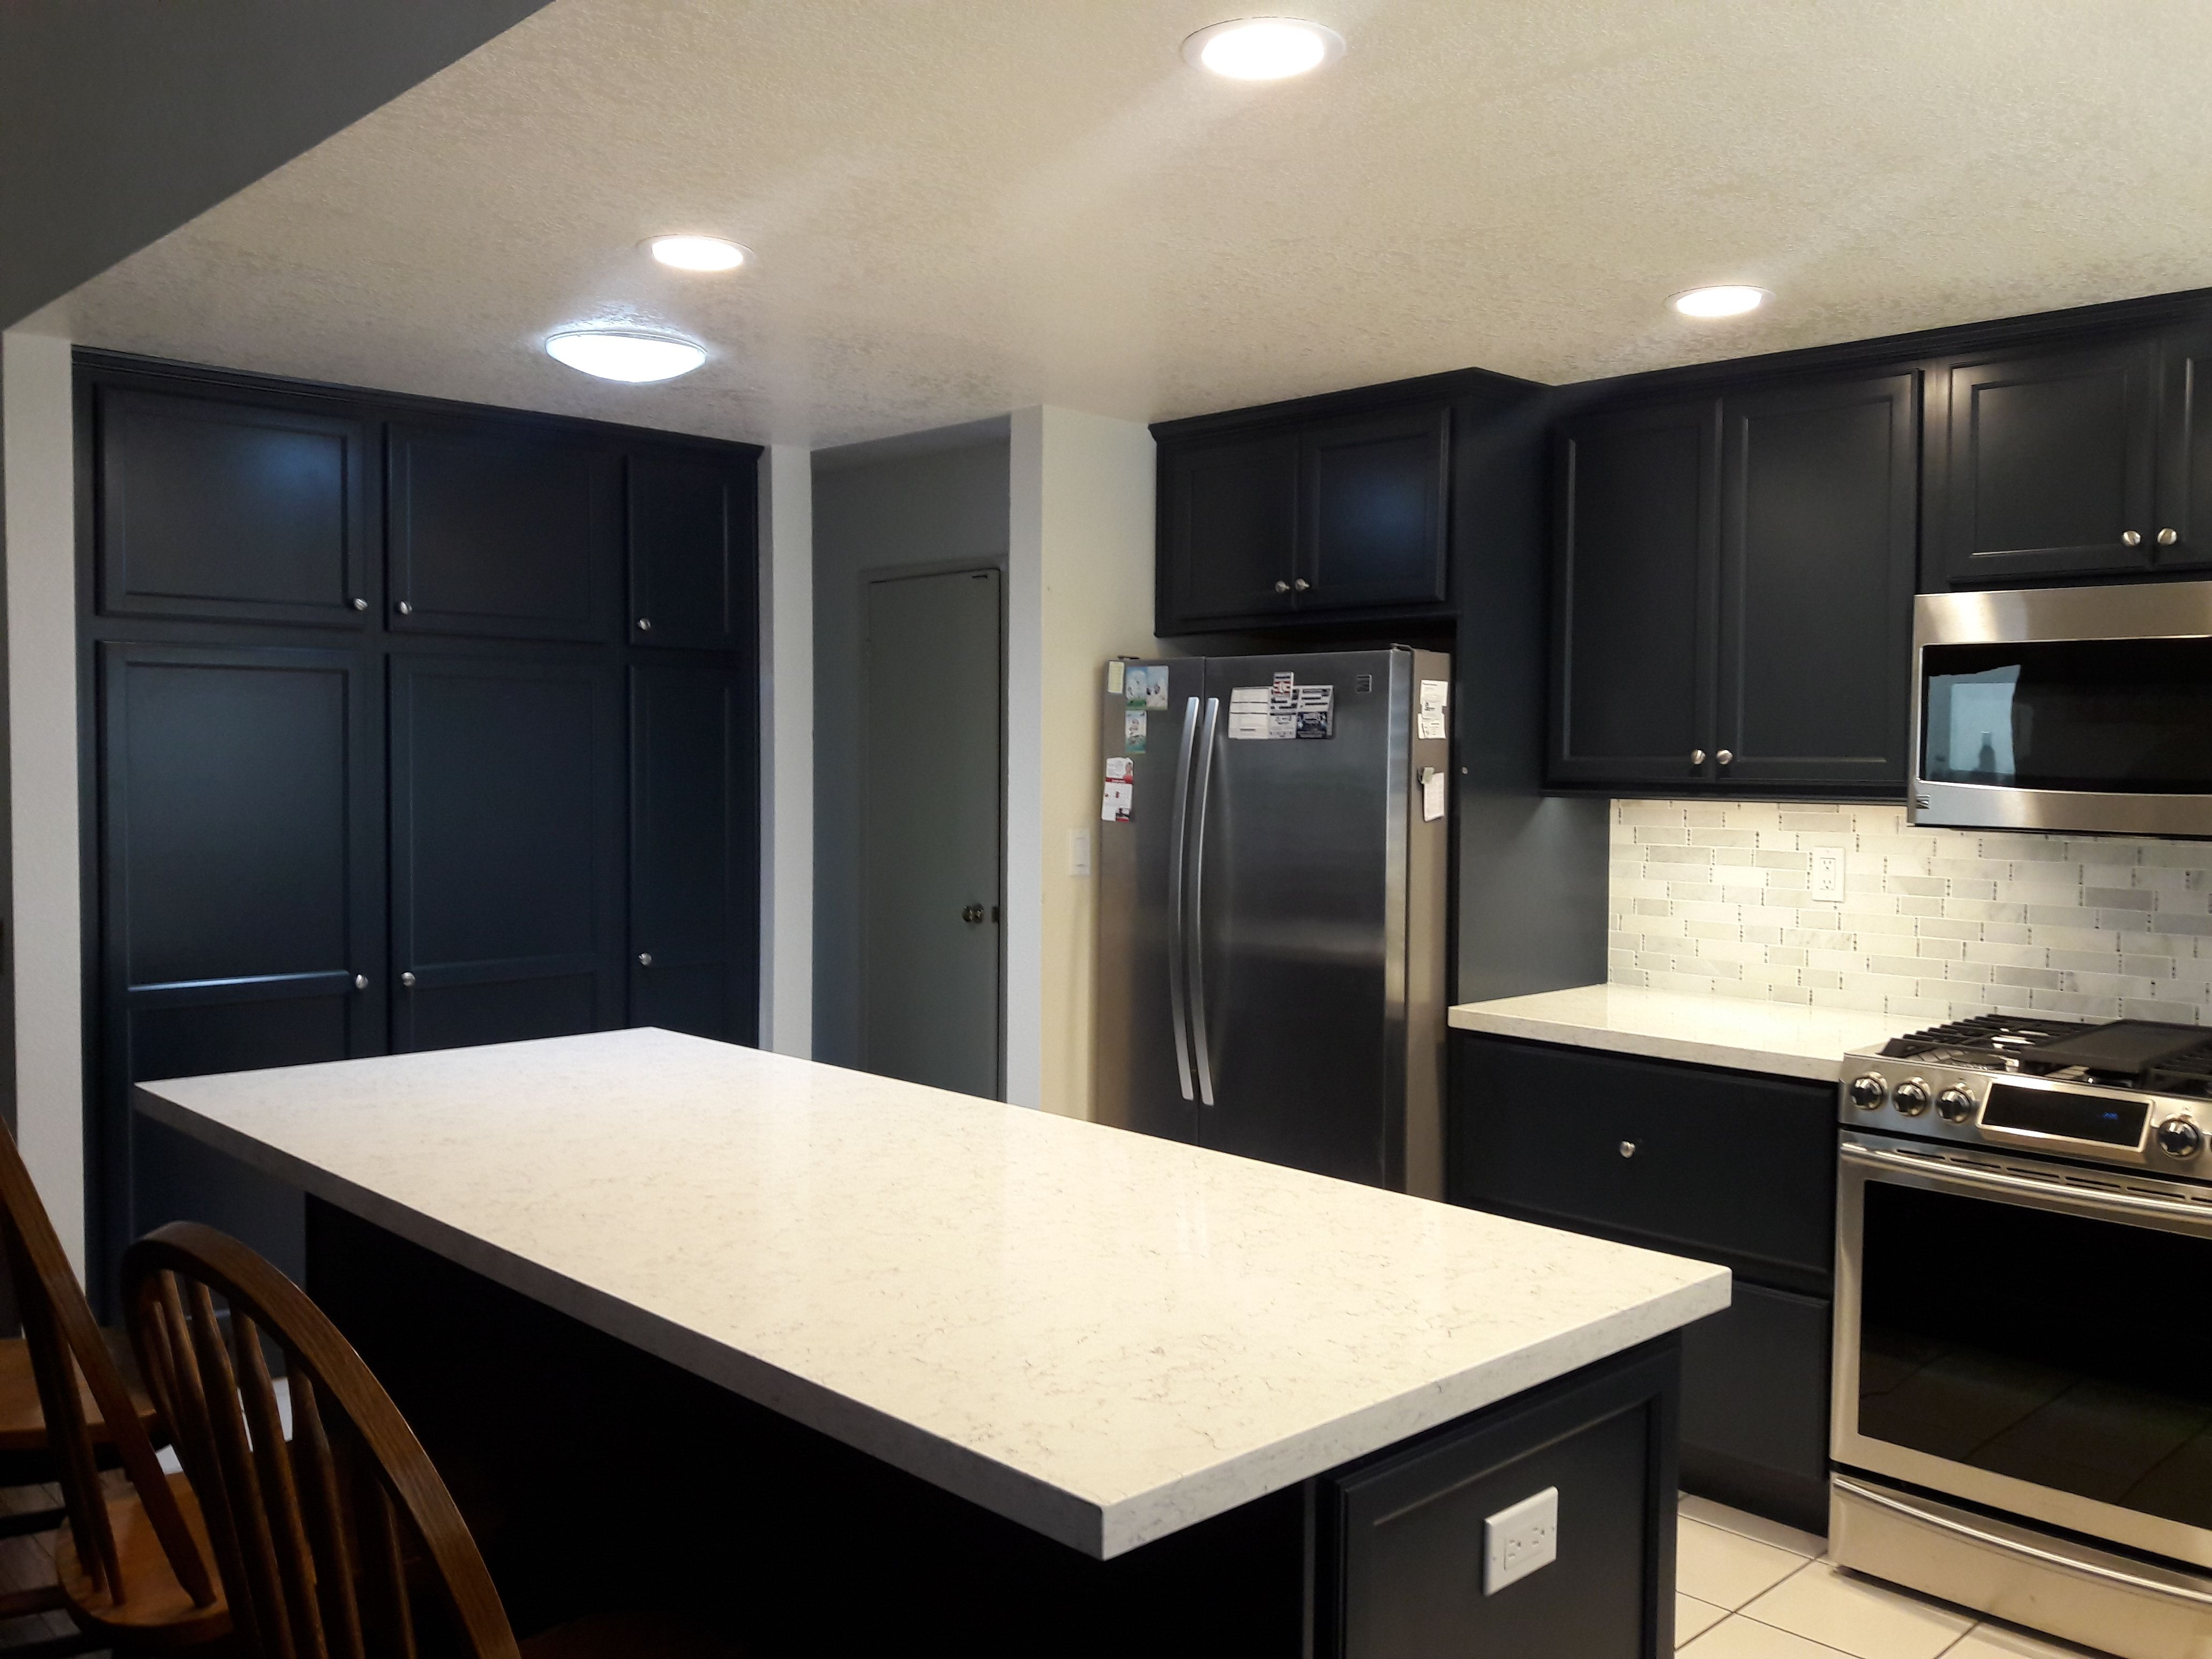 Kitchen Diamond Cabinets Ridgefield Door In Maritime Silestone Blanco Orion Quartz Stone And Glas Kitchen Backsplash Tile Designs Kitchen Kitchen Backsplash